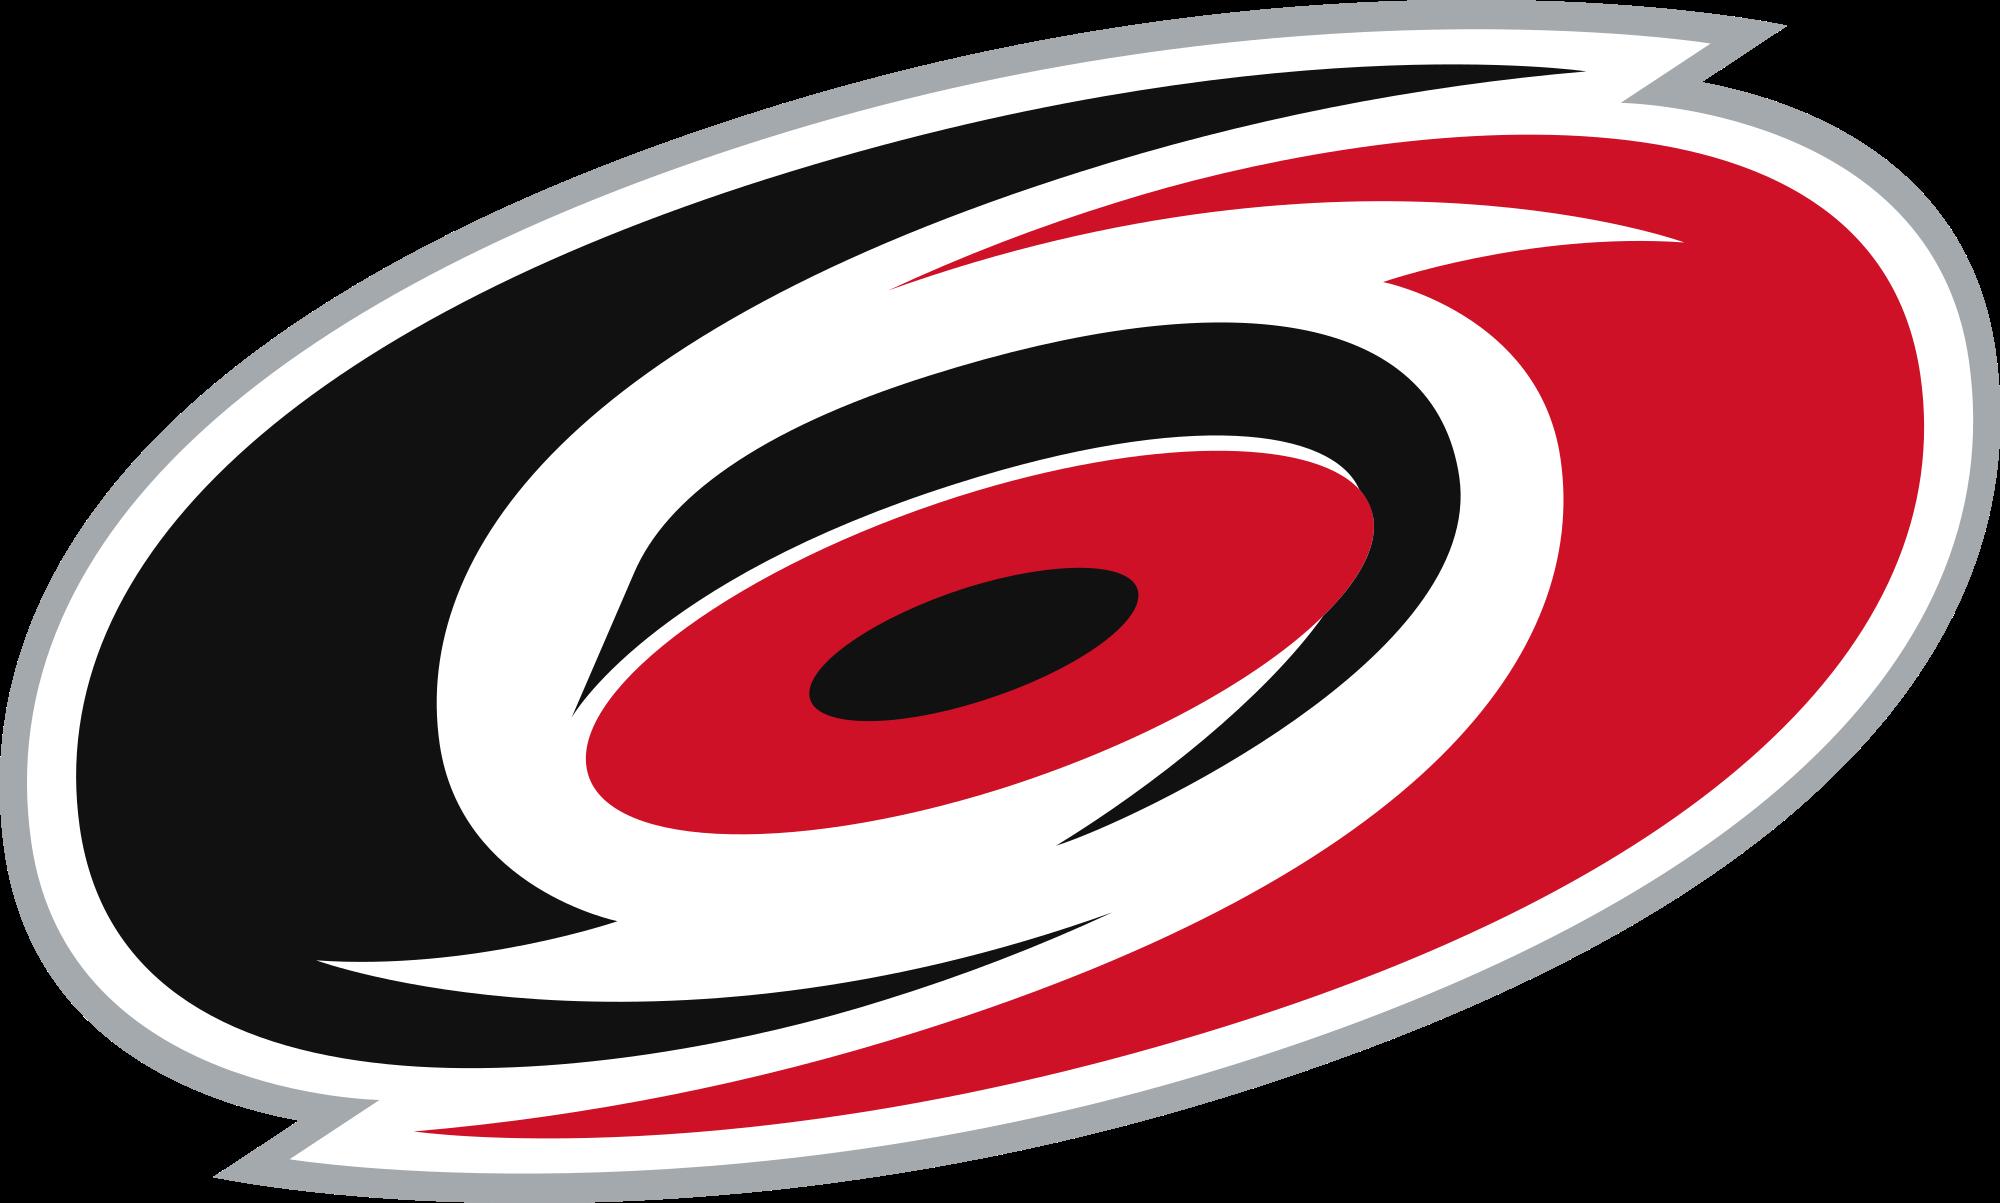 Hurricane clipart hurricane eye. Logos